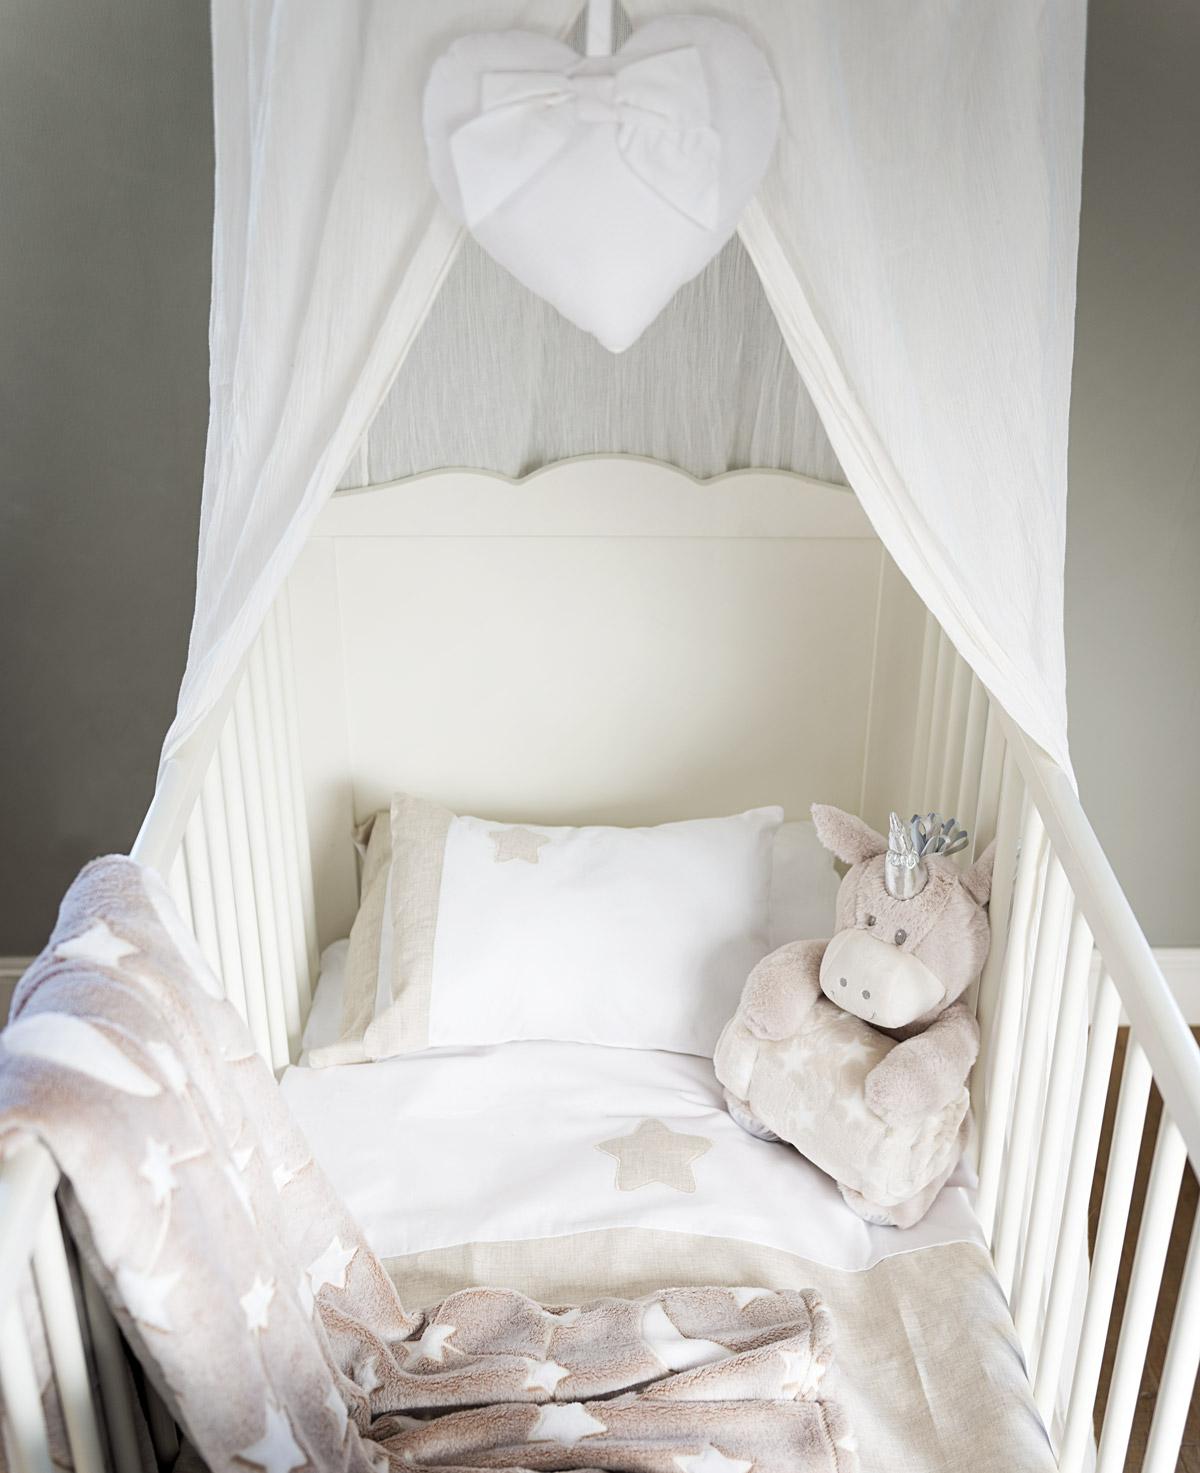 Blanc MariClo' Cameretta shabby chic per bambini tessuti e lettino - Blog